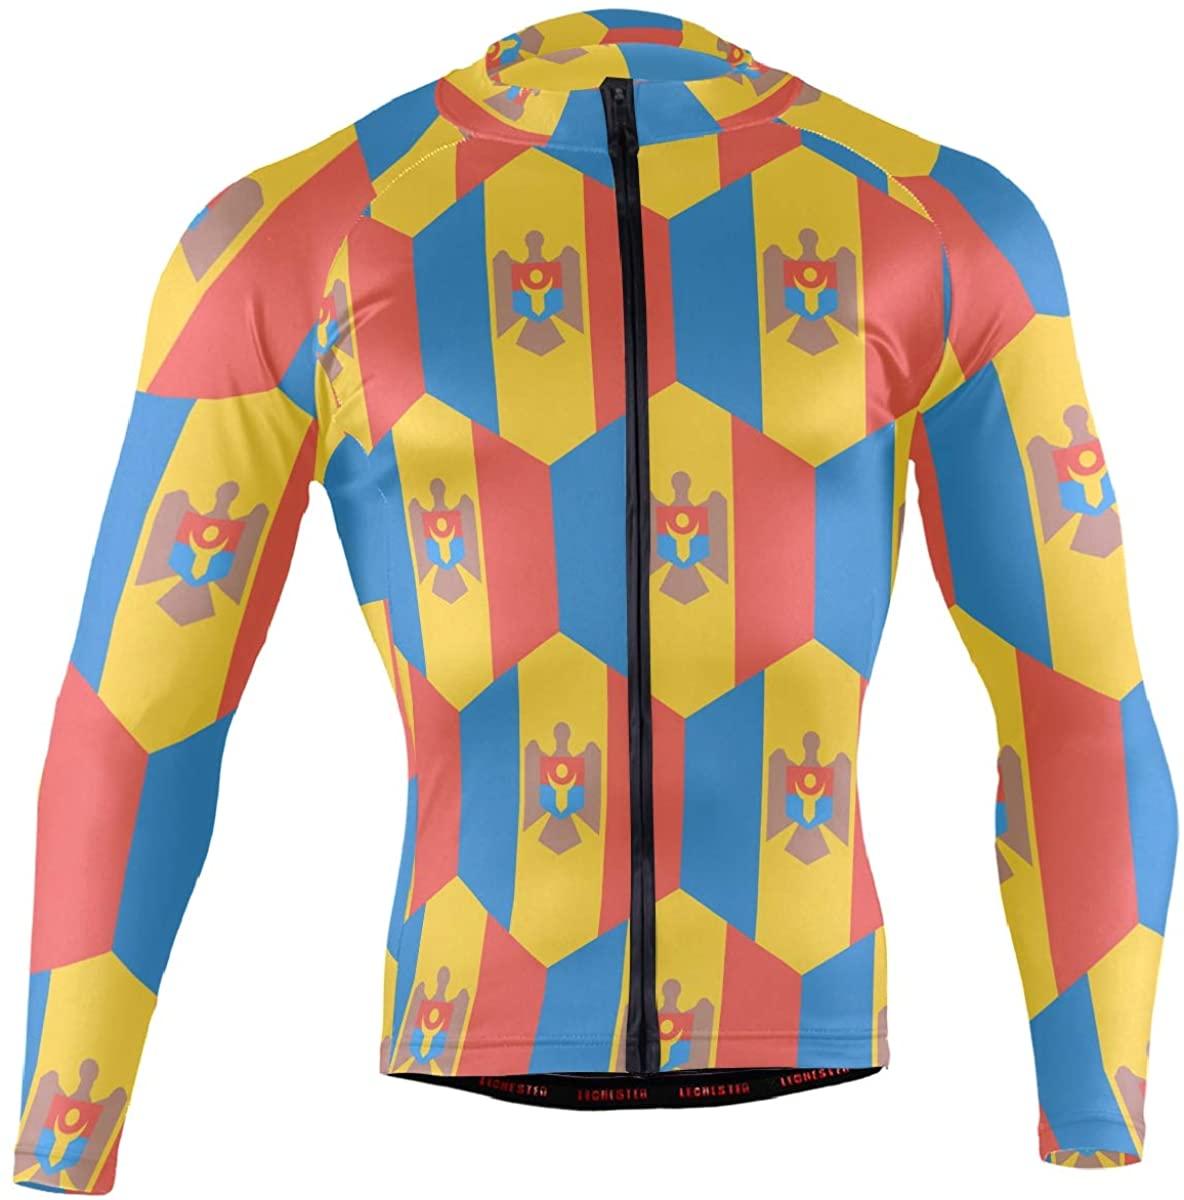 Moldova Flag Men's Long Sleeve Cycling Jersey Bicycle Jacket Pockets Full Zipper Bike Biking Shirts